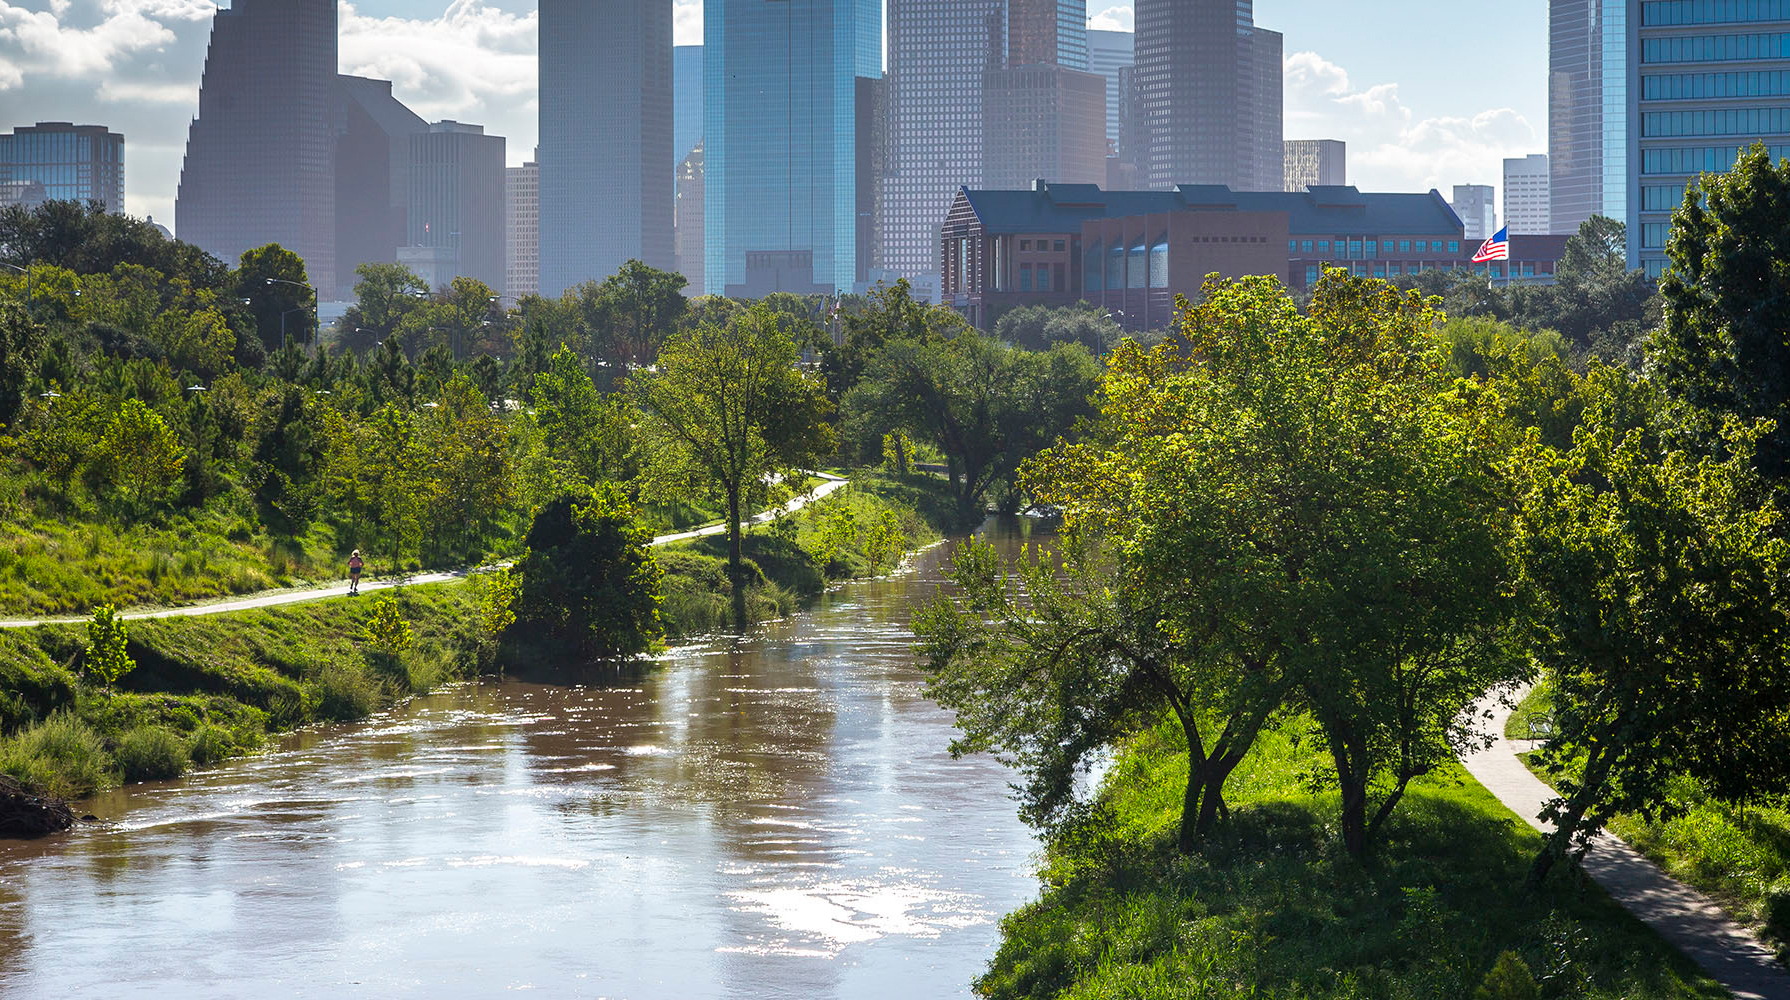 A cityscape against a river